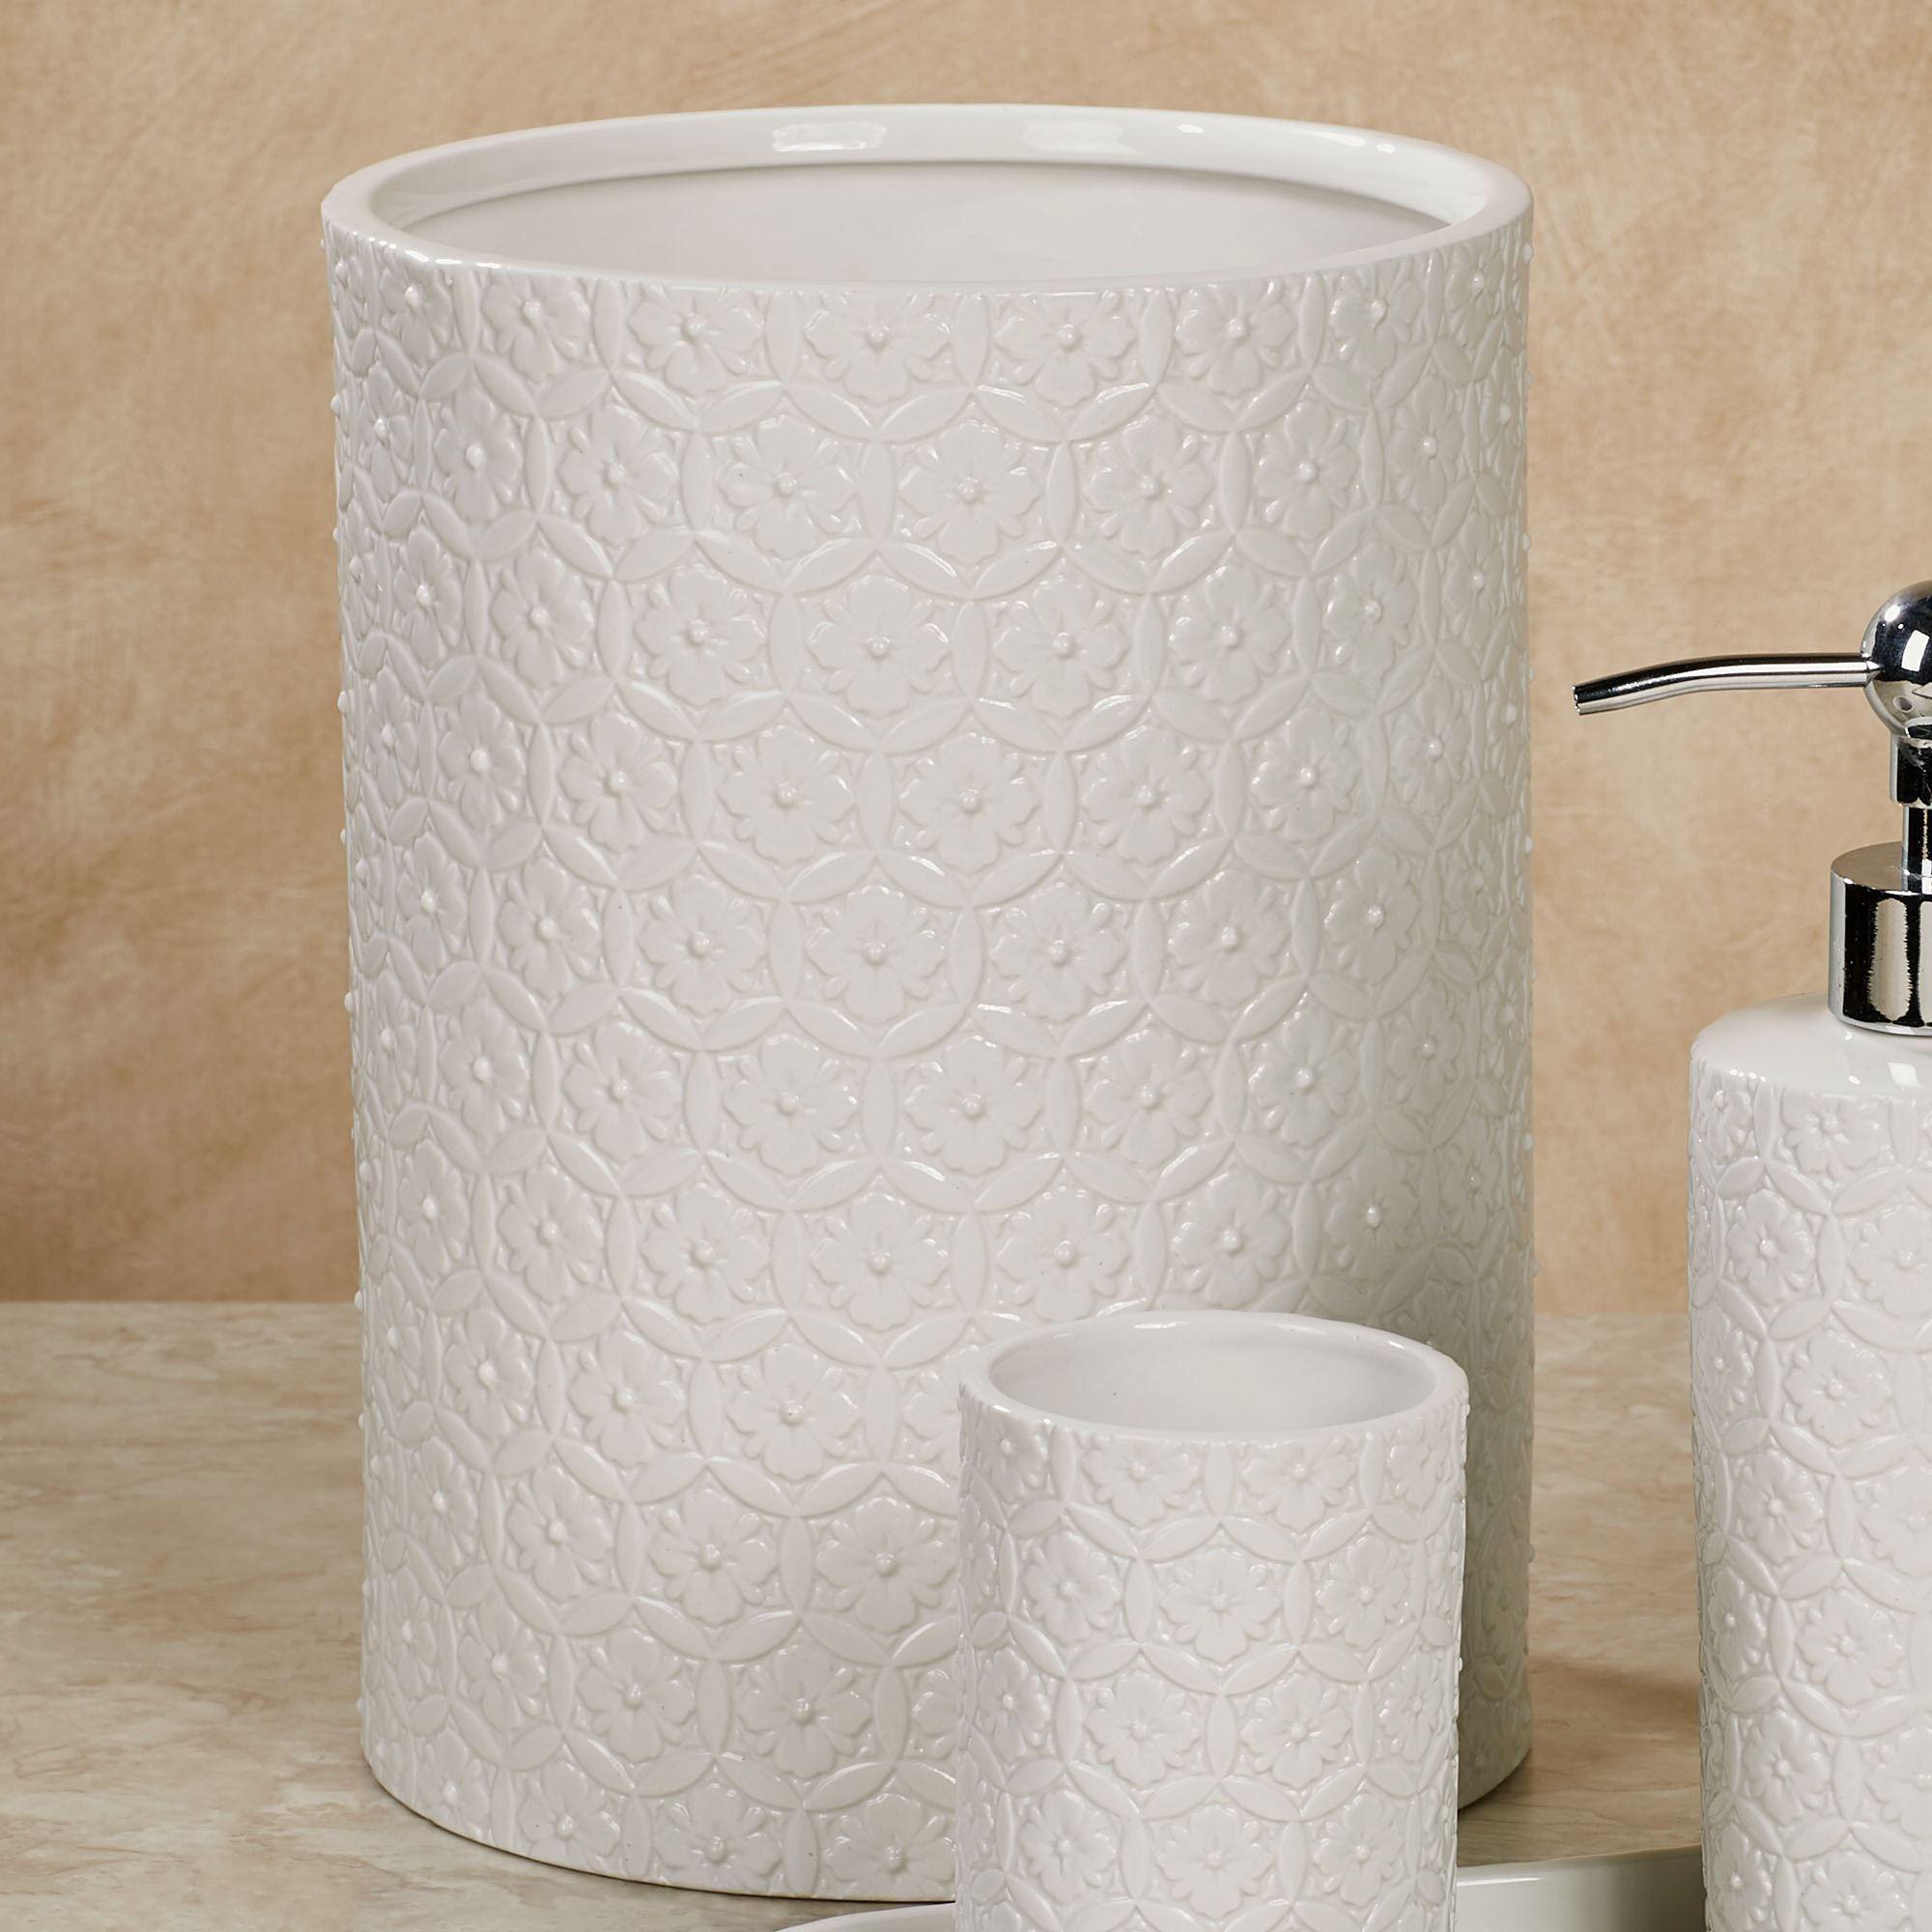 Best white porcelain bathroom accessories ideas bathtub for Best bathtub accessories